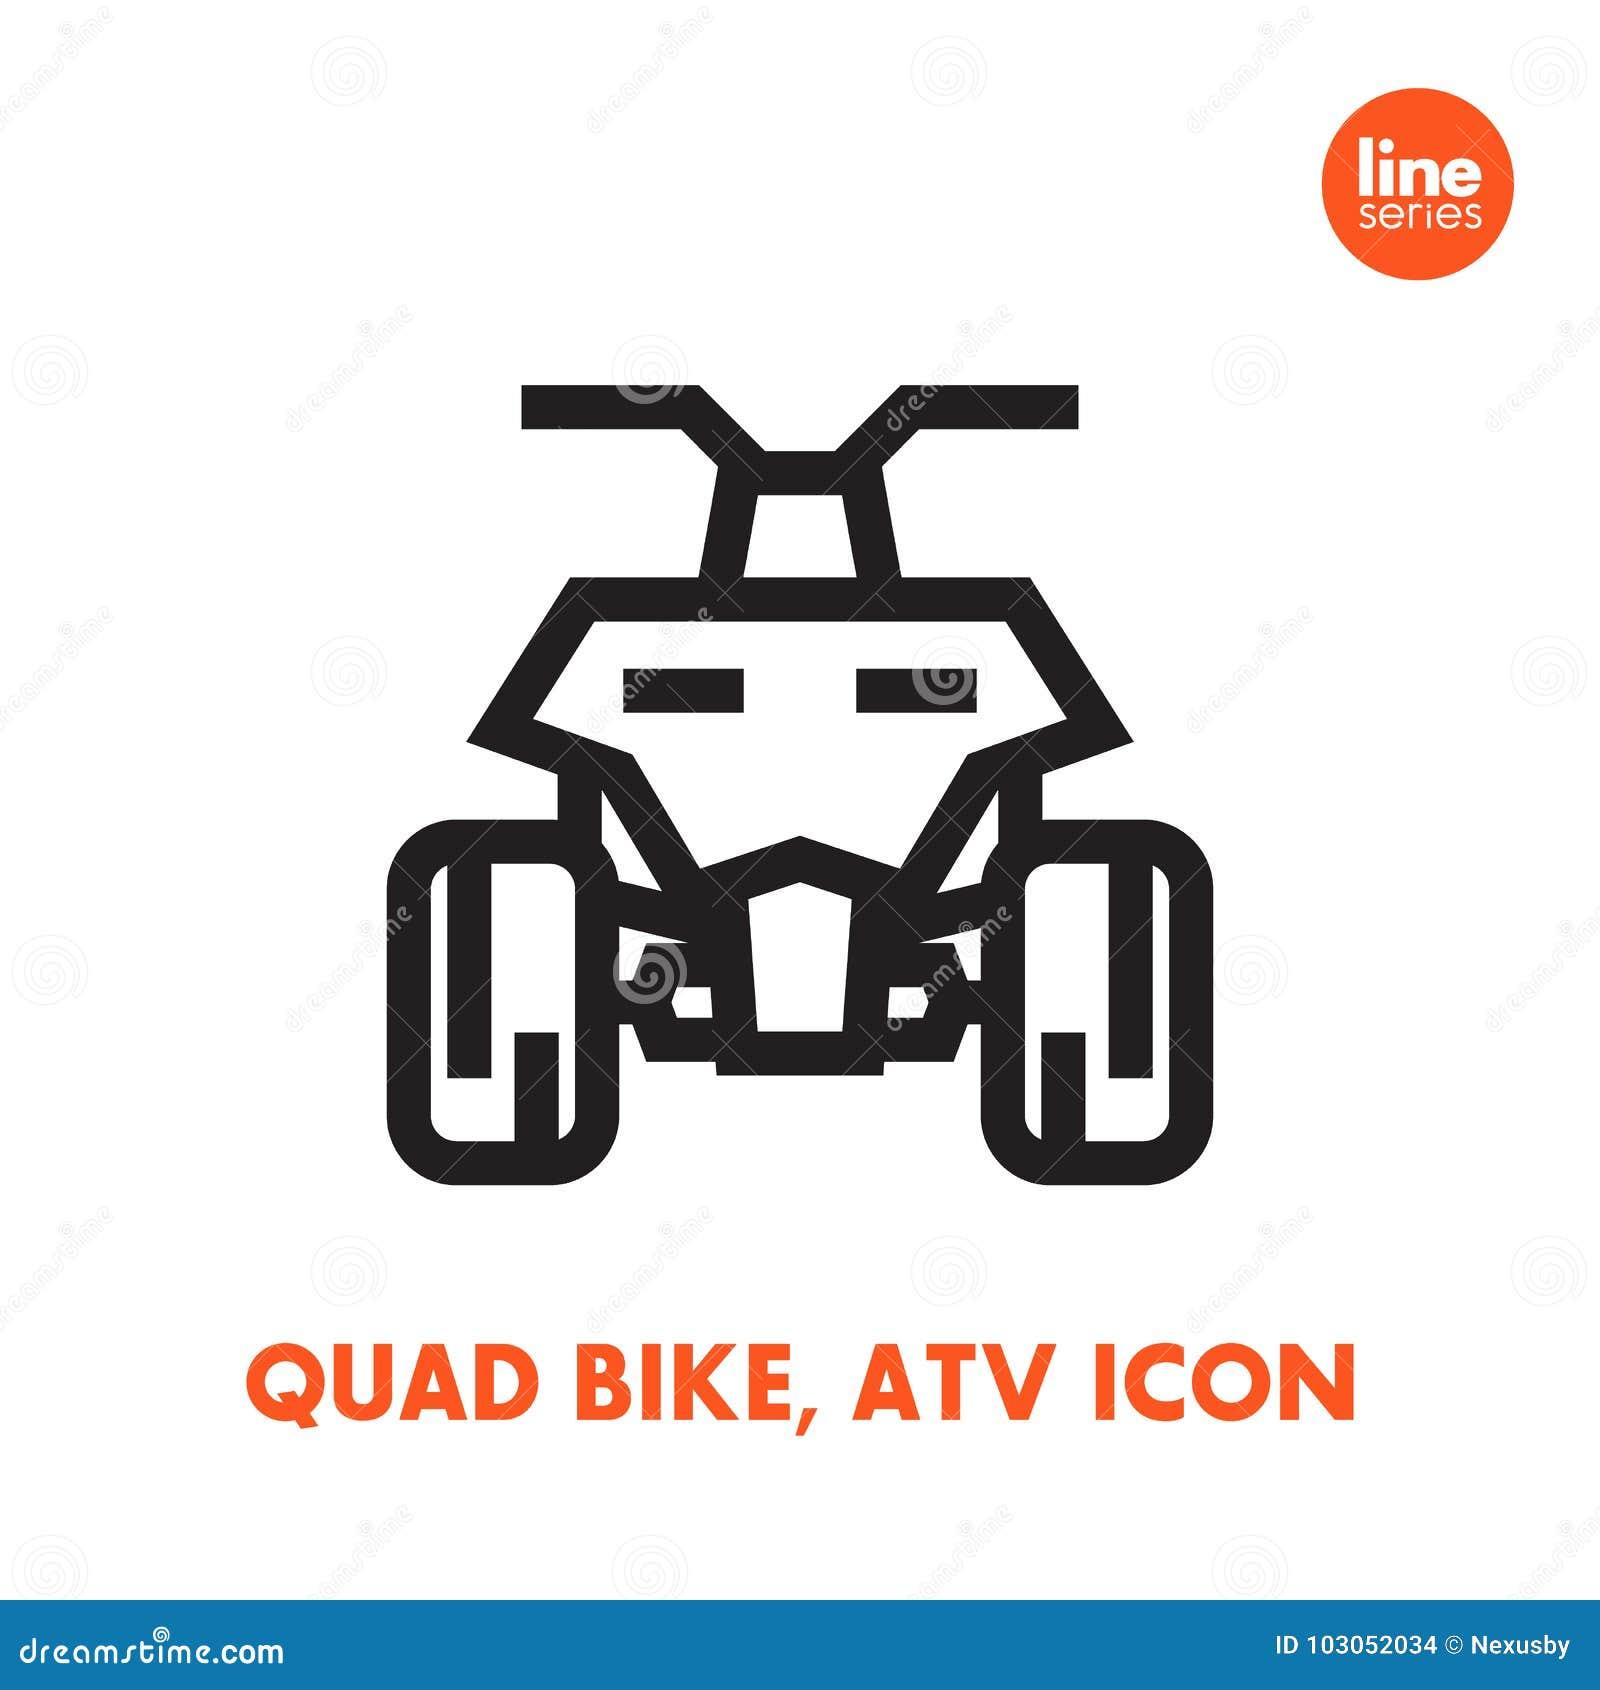 Ícone da bicicleta do quadrilátero, todo o veículo ATV do terreno